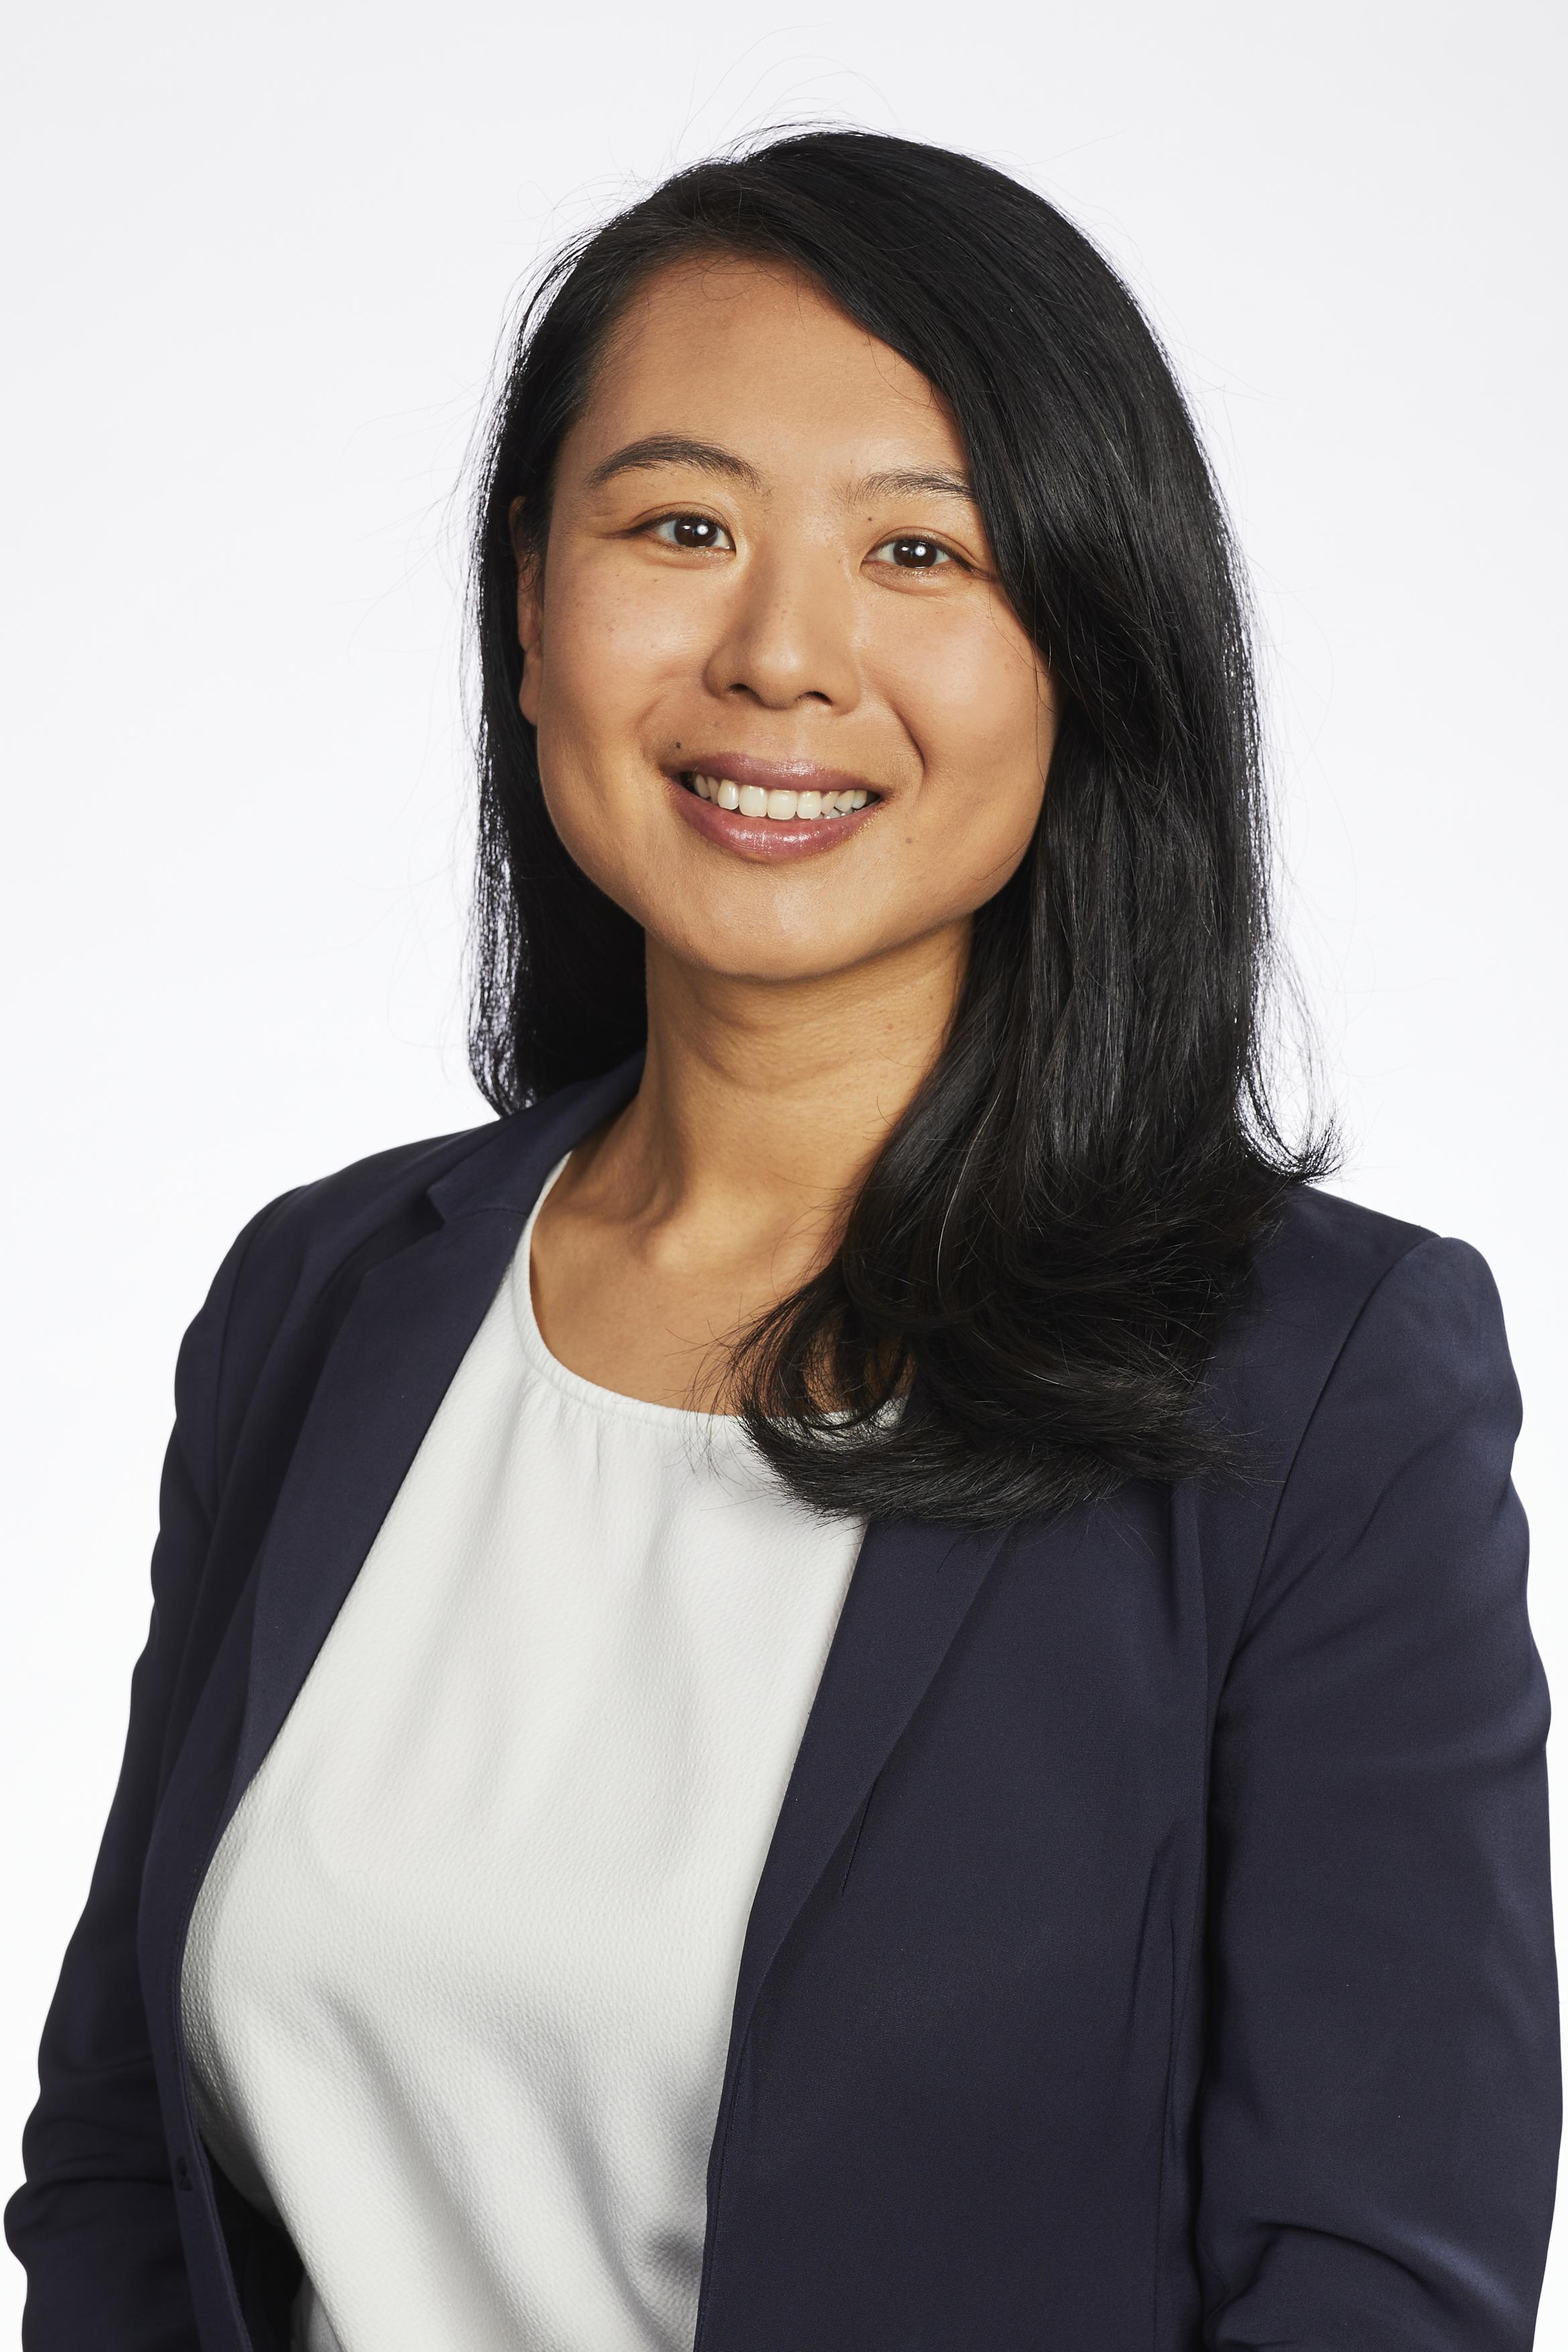 Julia  Wang, BCL (Dist); LLB (Hons); BSc